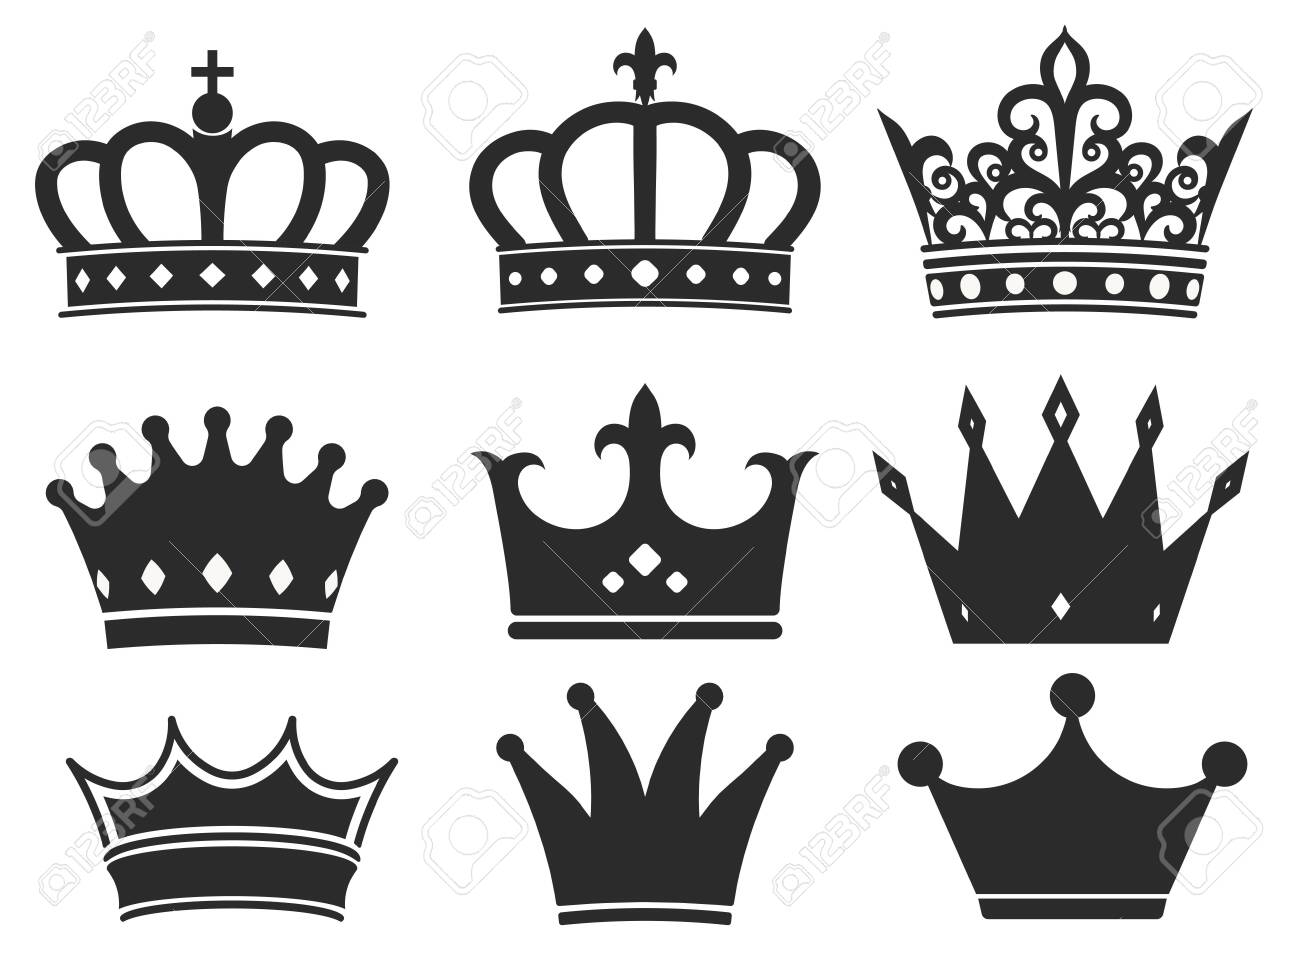 Crown silhouette icon collection. Royal diadem symbol set, majestic tiara black elements. Vector illustration - 136075102